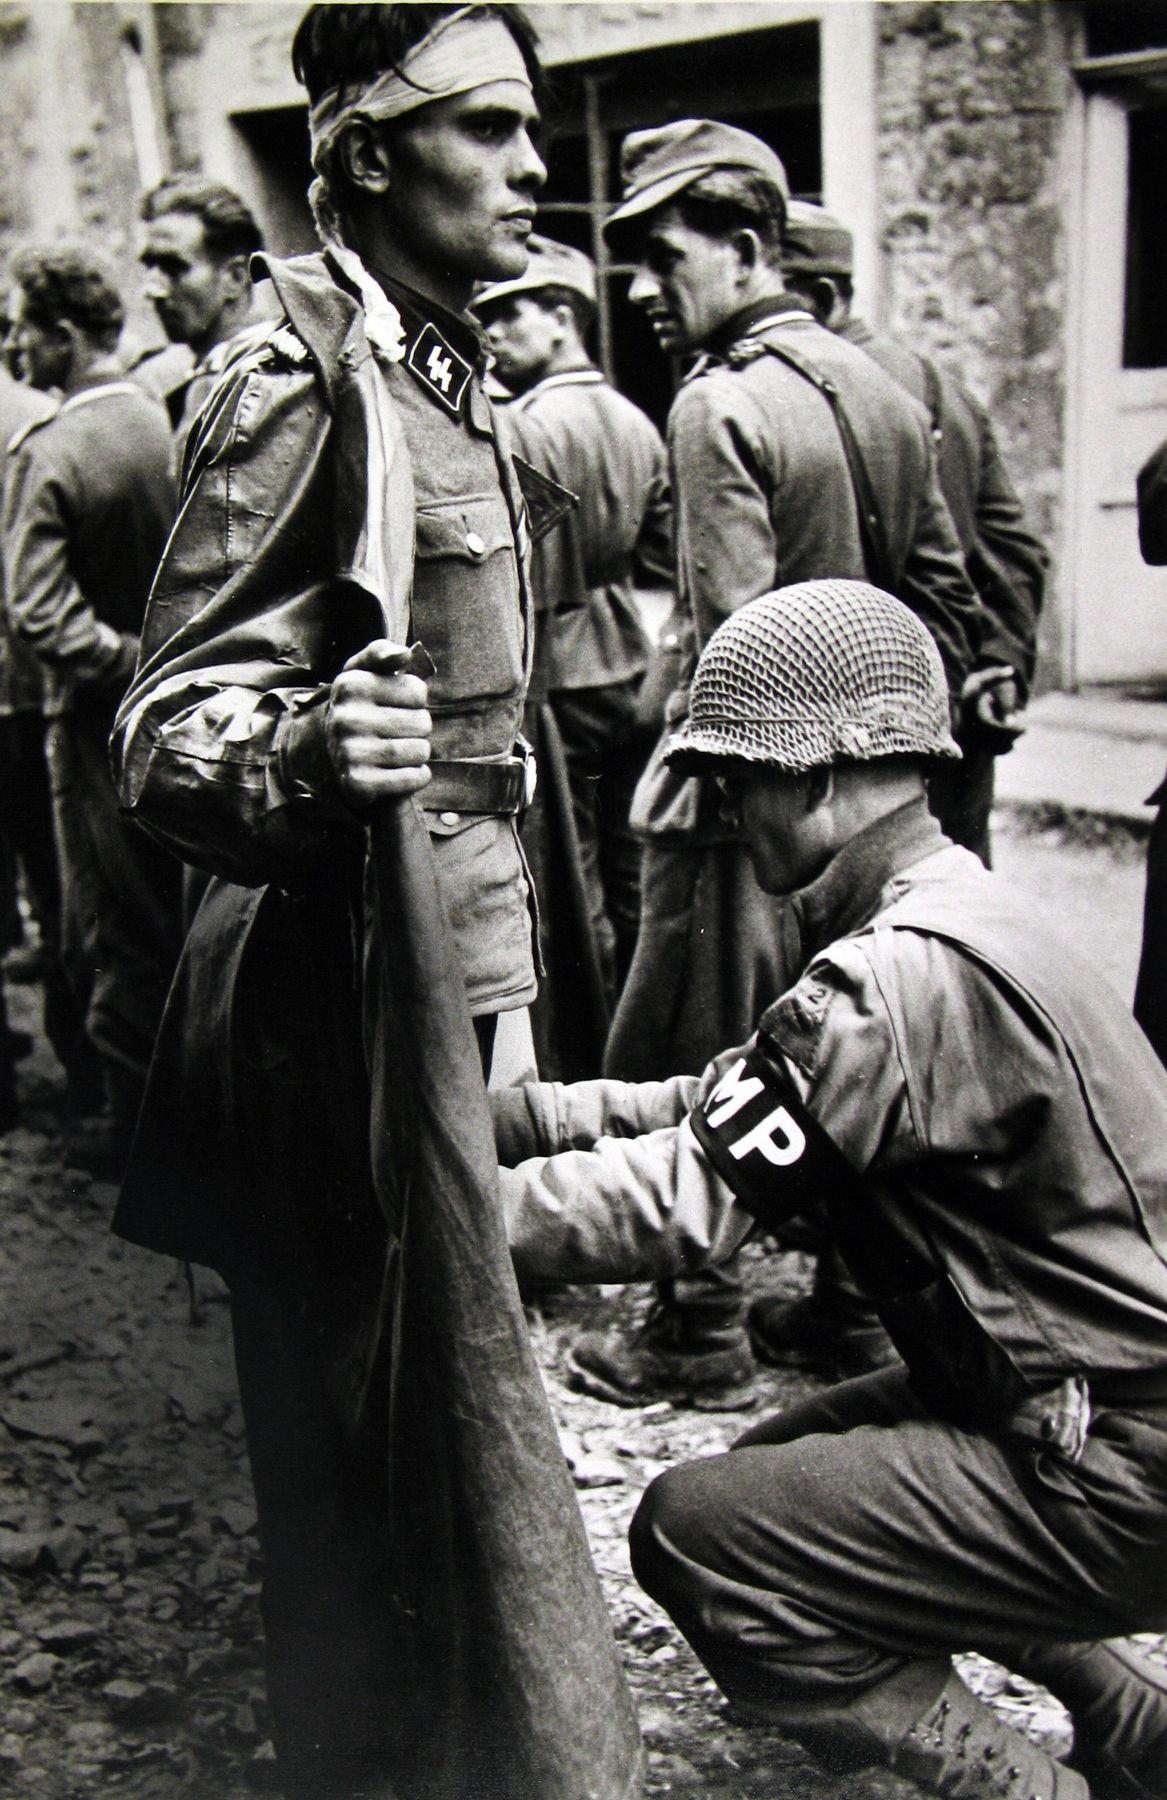 Robert Capa - War, 1939-45 - Howard Greenberg Gallery